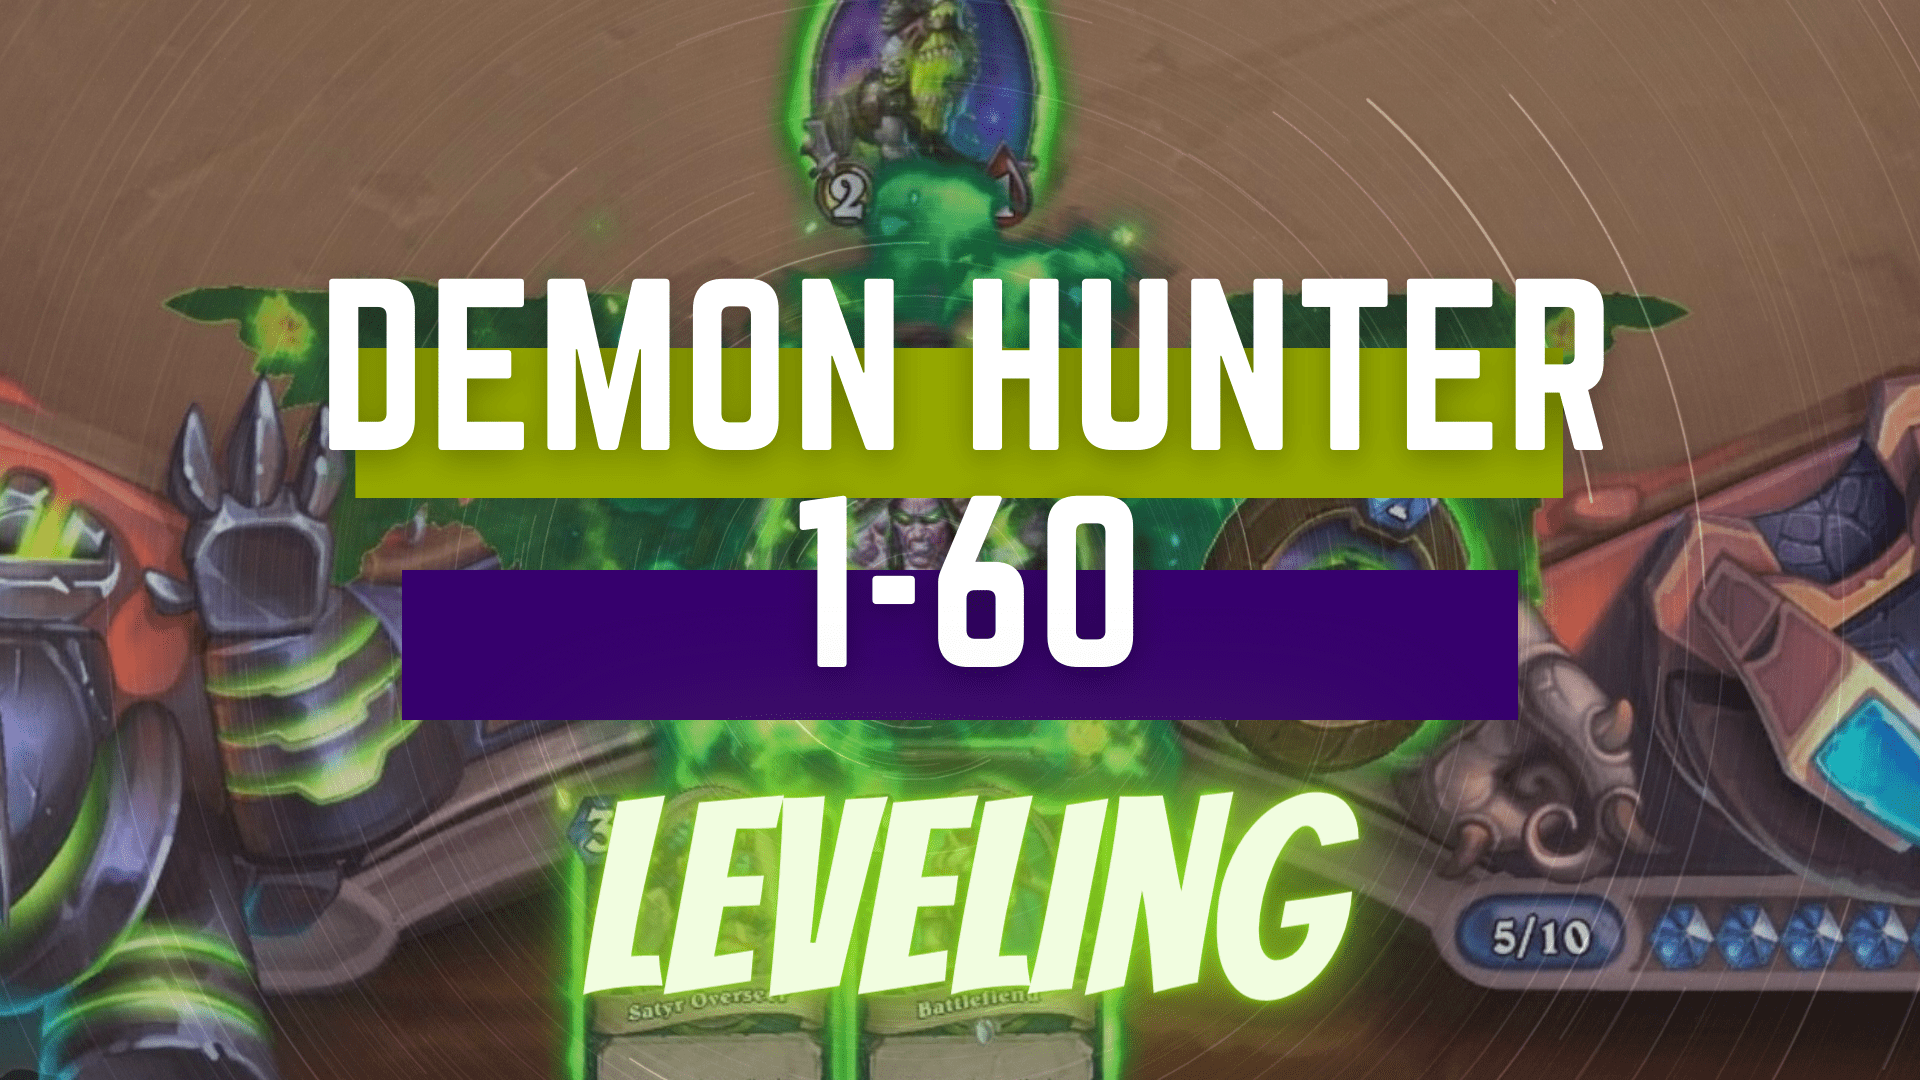 Demon Hunter 1-60 Leveling Zafari - e2p.com